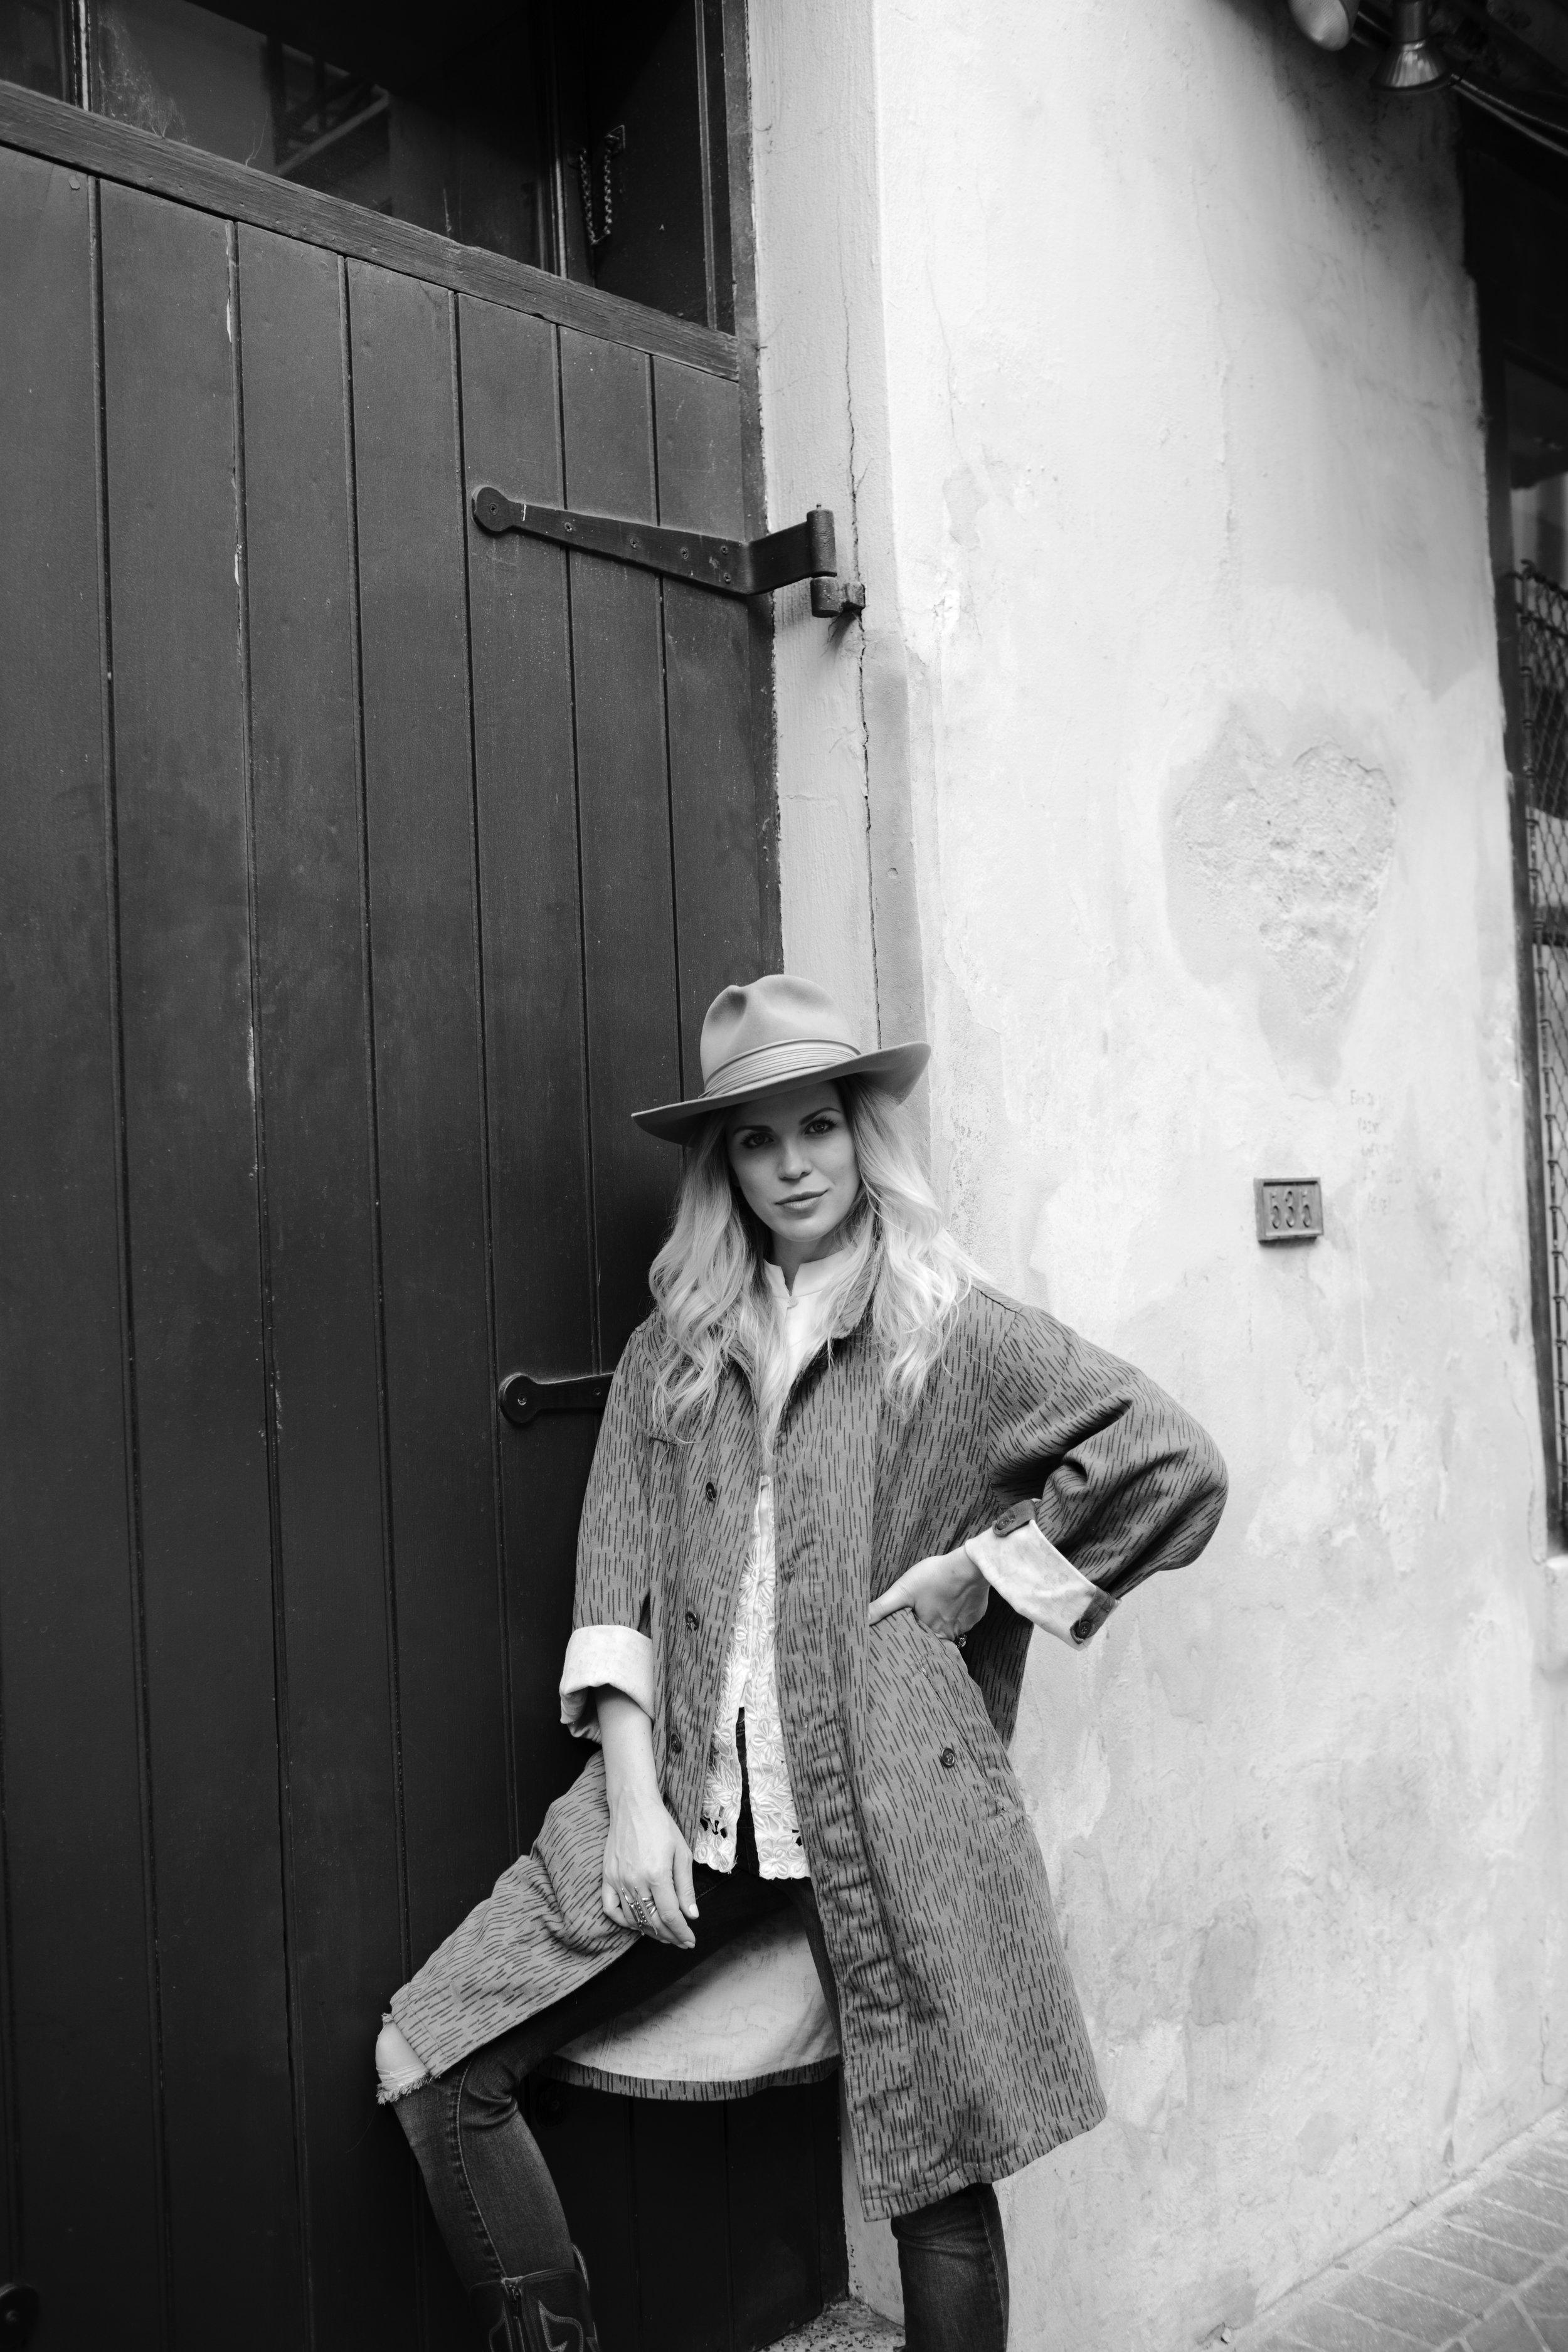 Kristin Diable Press Photo March 2017 by Nathan Rocky (1).jpeg